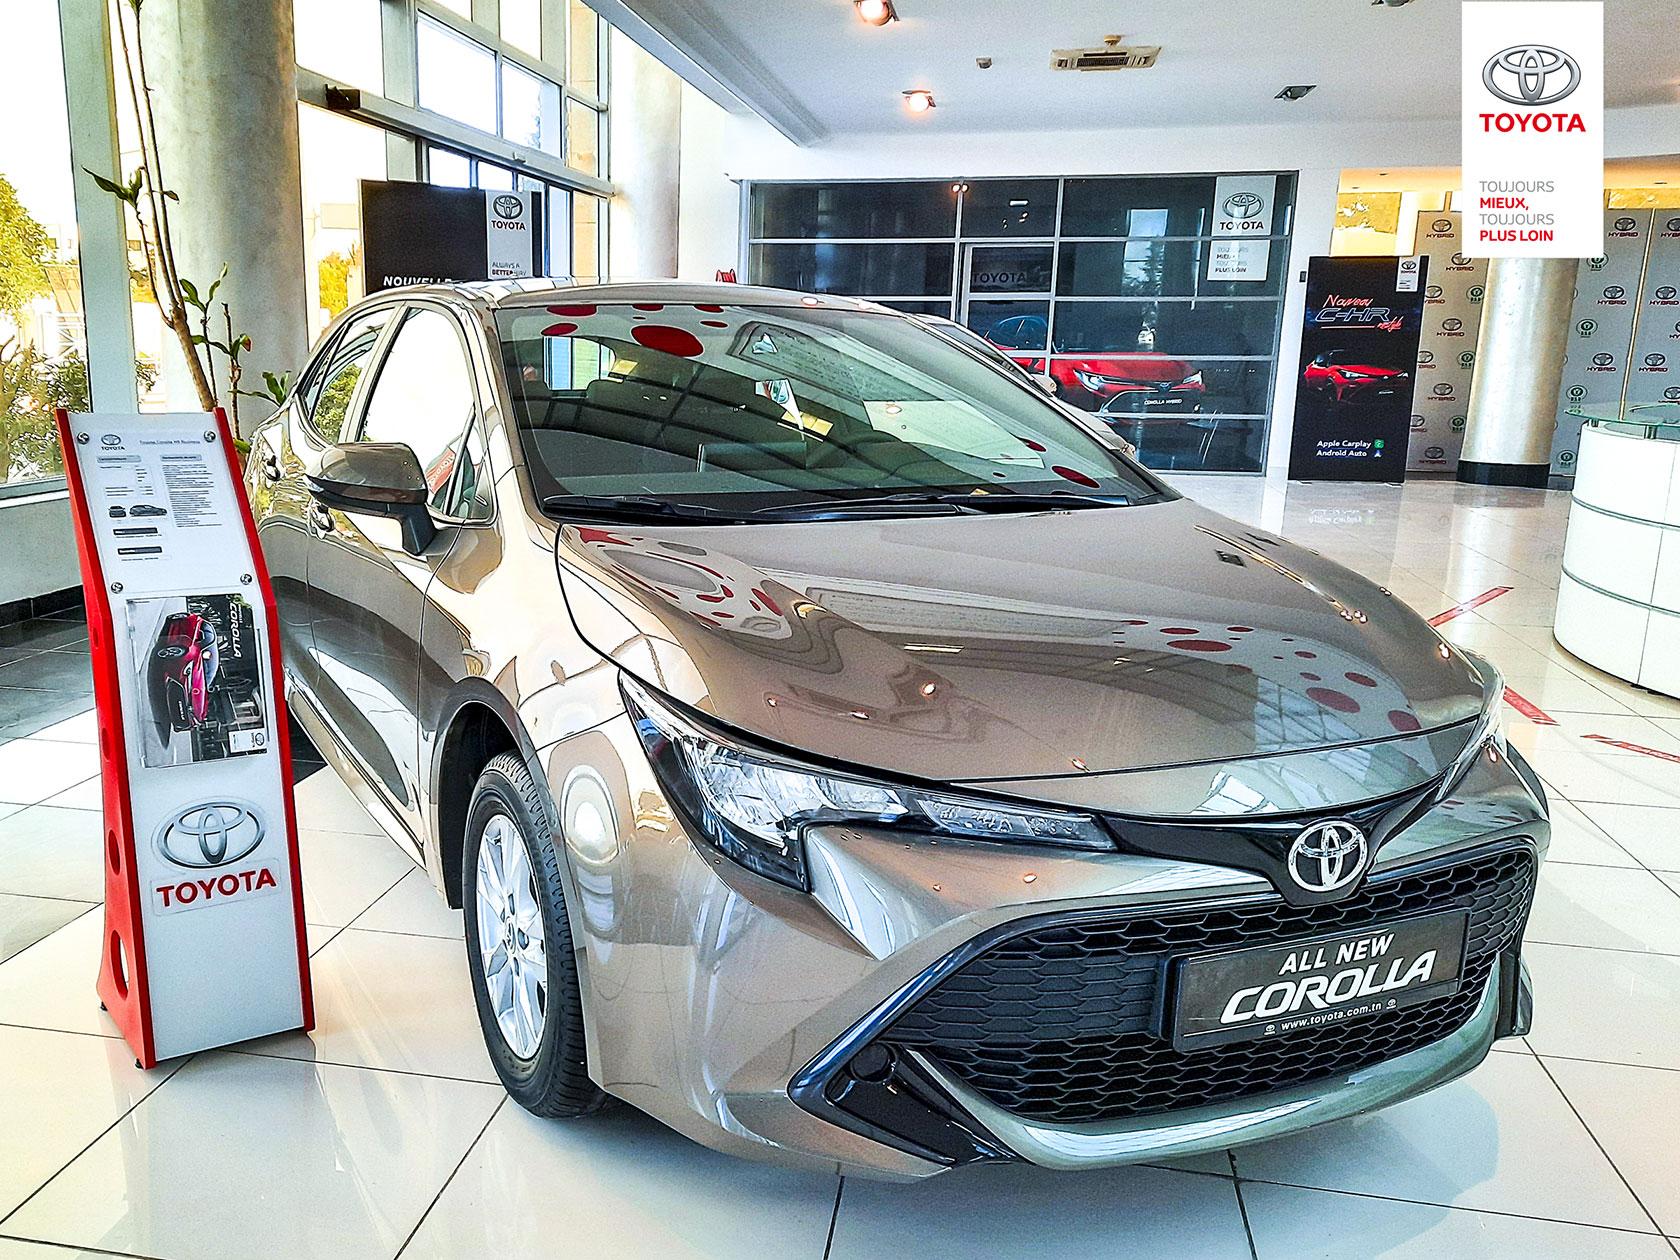 La Toyota Corolla reste la voiture la plus vendue en 2020